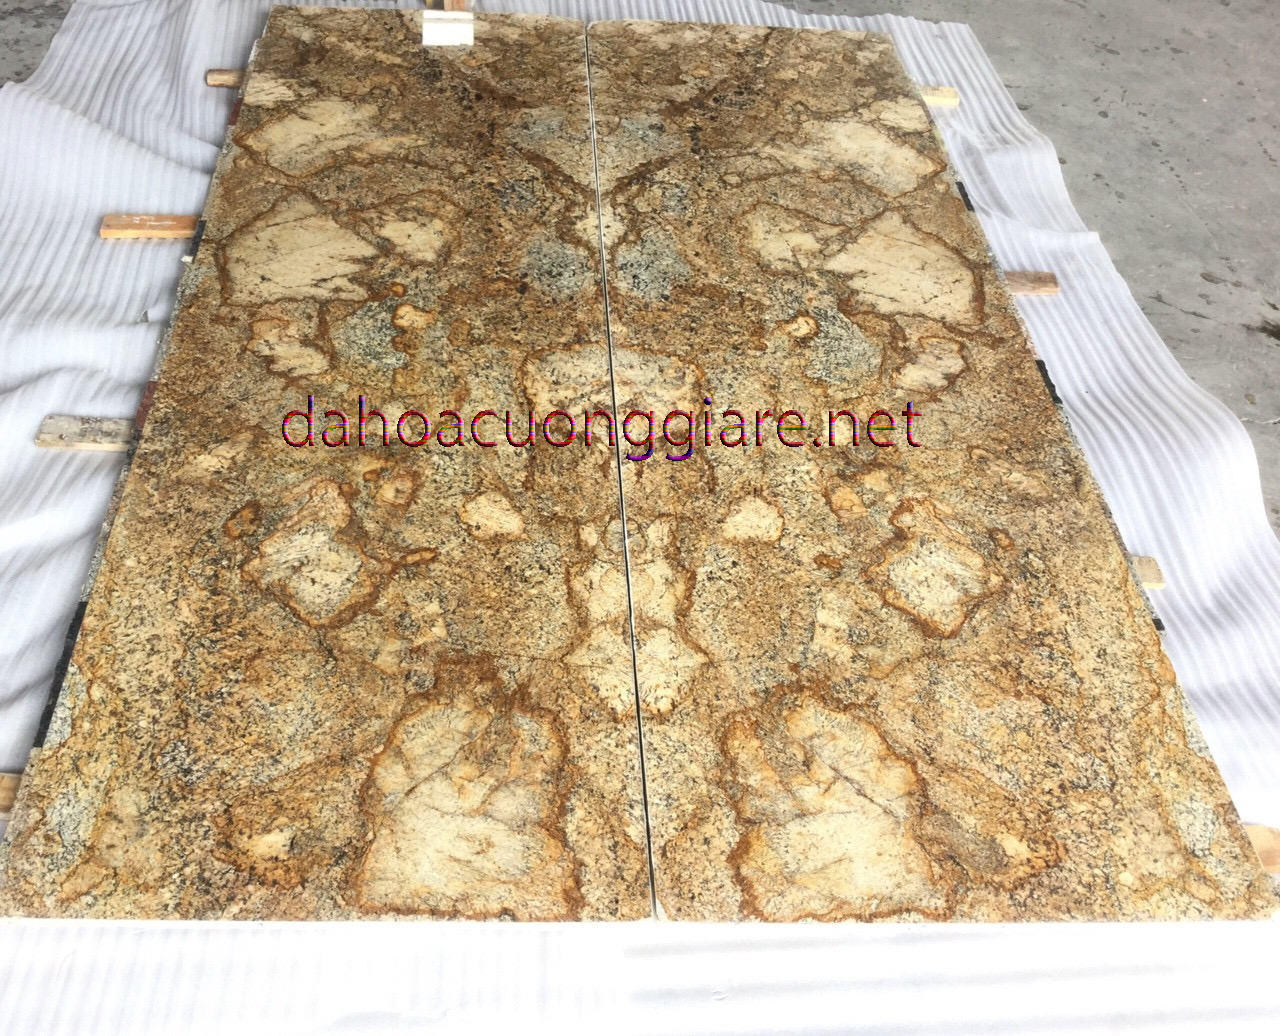 da-hoa-cuong-granite-alaska-gold